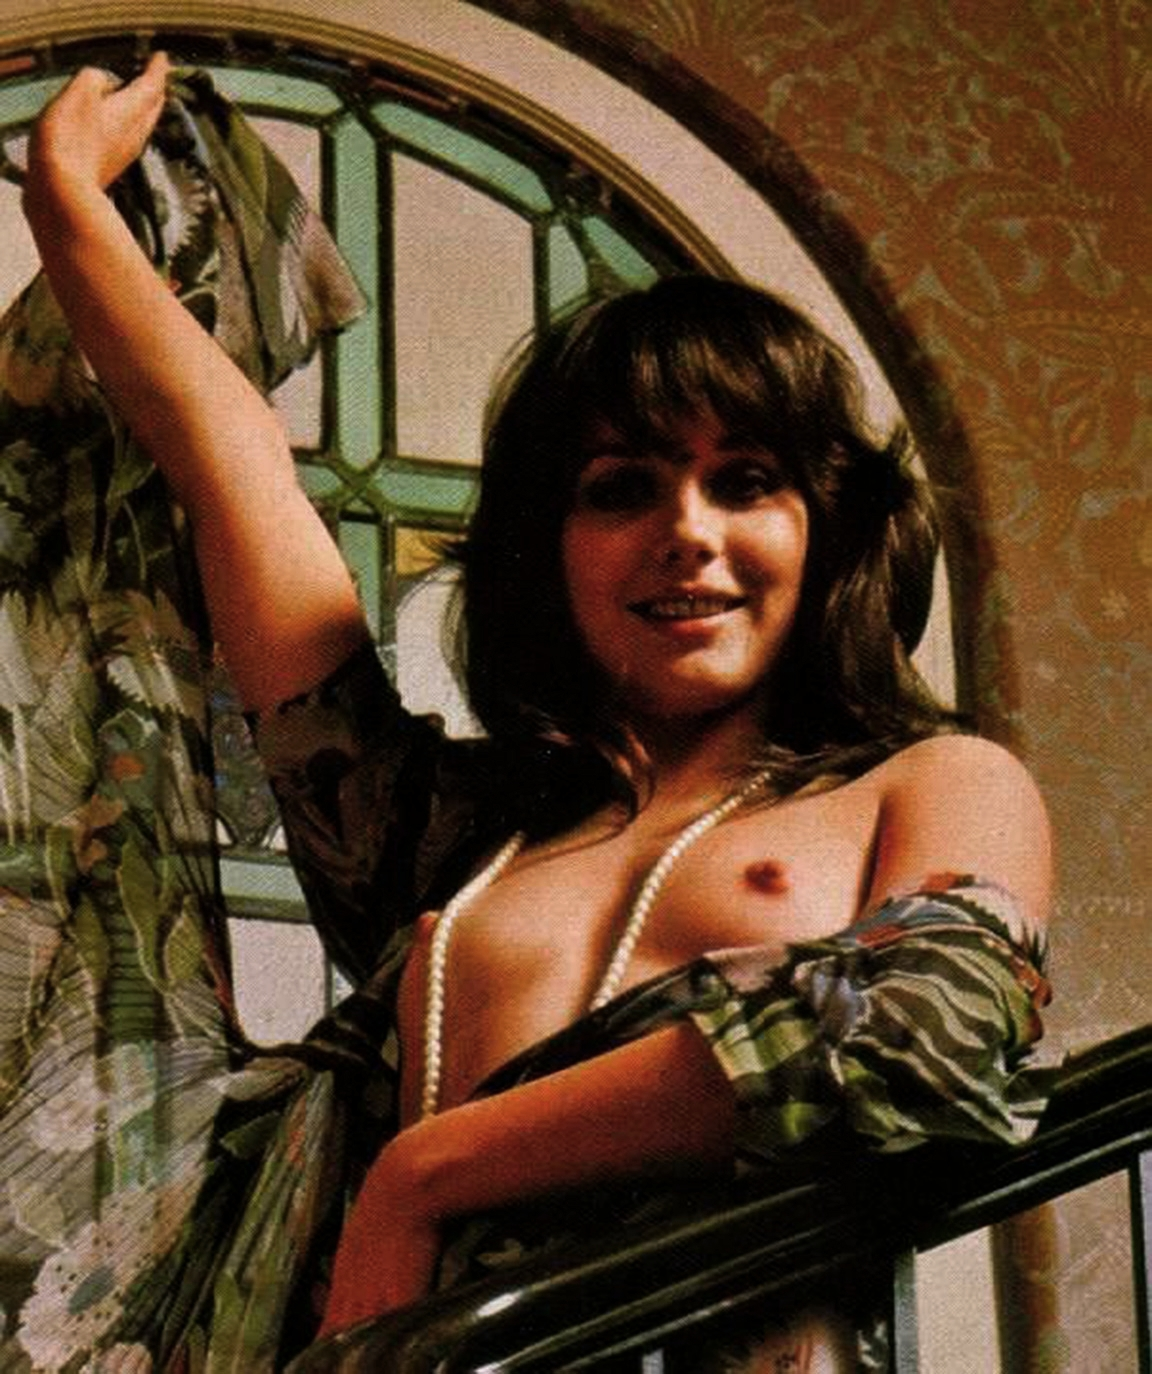 Lesley Nude